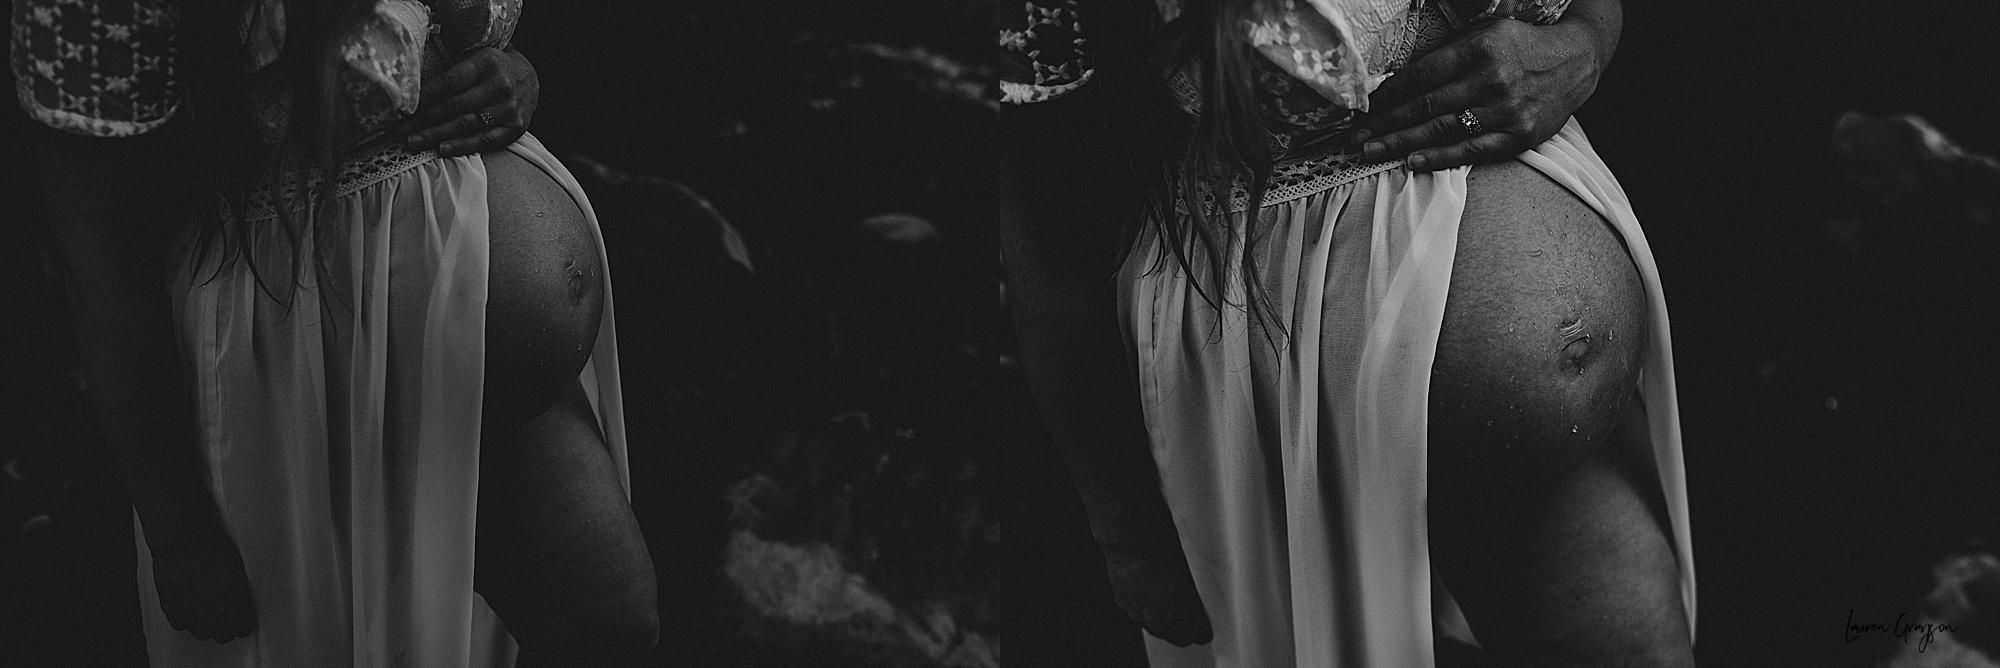 lauren-grayson-photography-akron-ohio-maternity-photographer-waterfall-sarah-f_0032.jpg